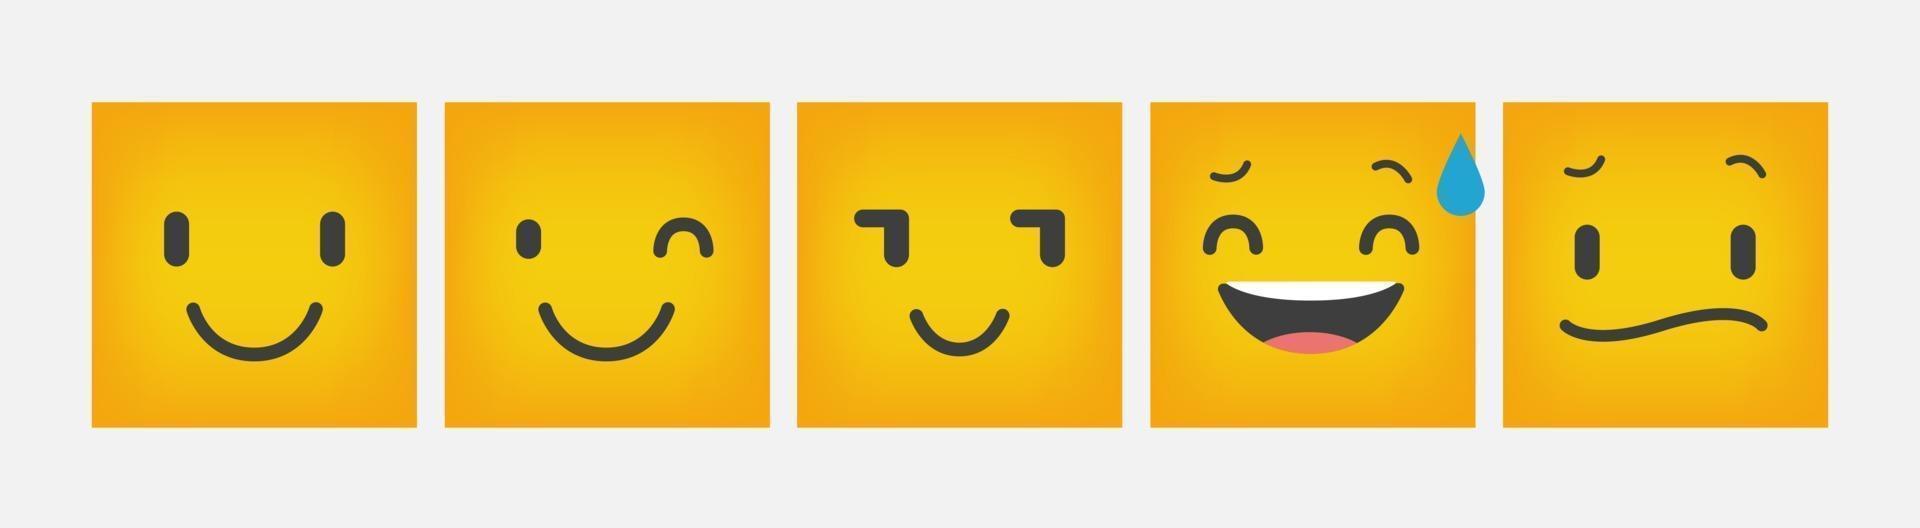 emoticon reactie vierkante platte ontwerpset - vector